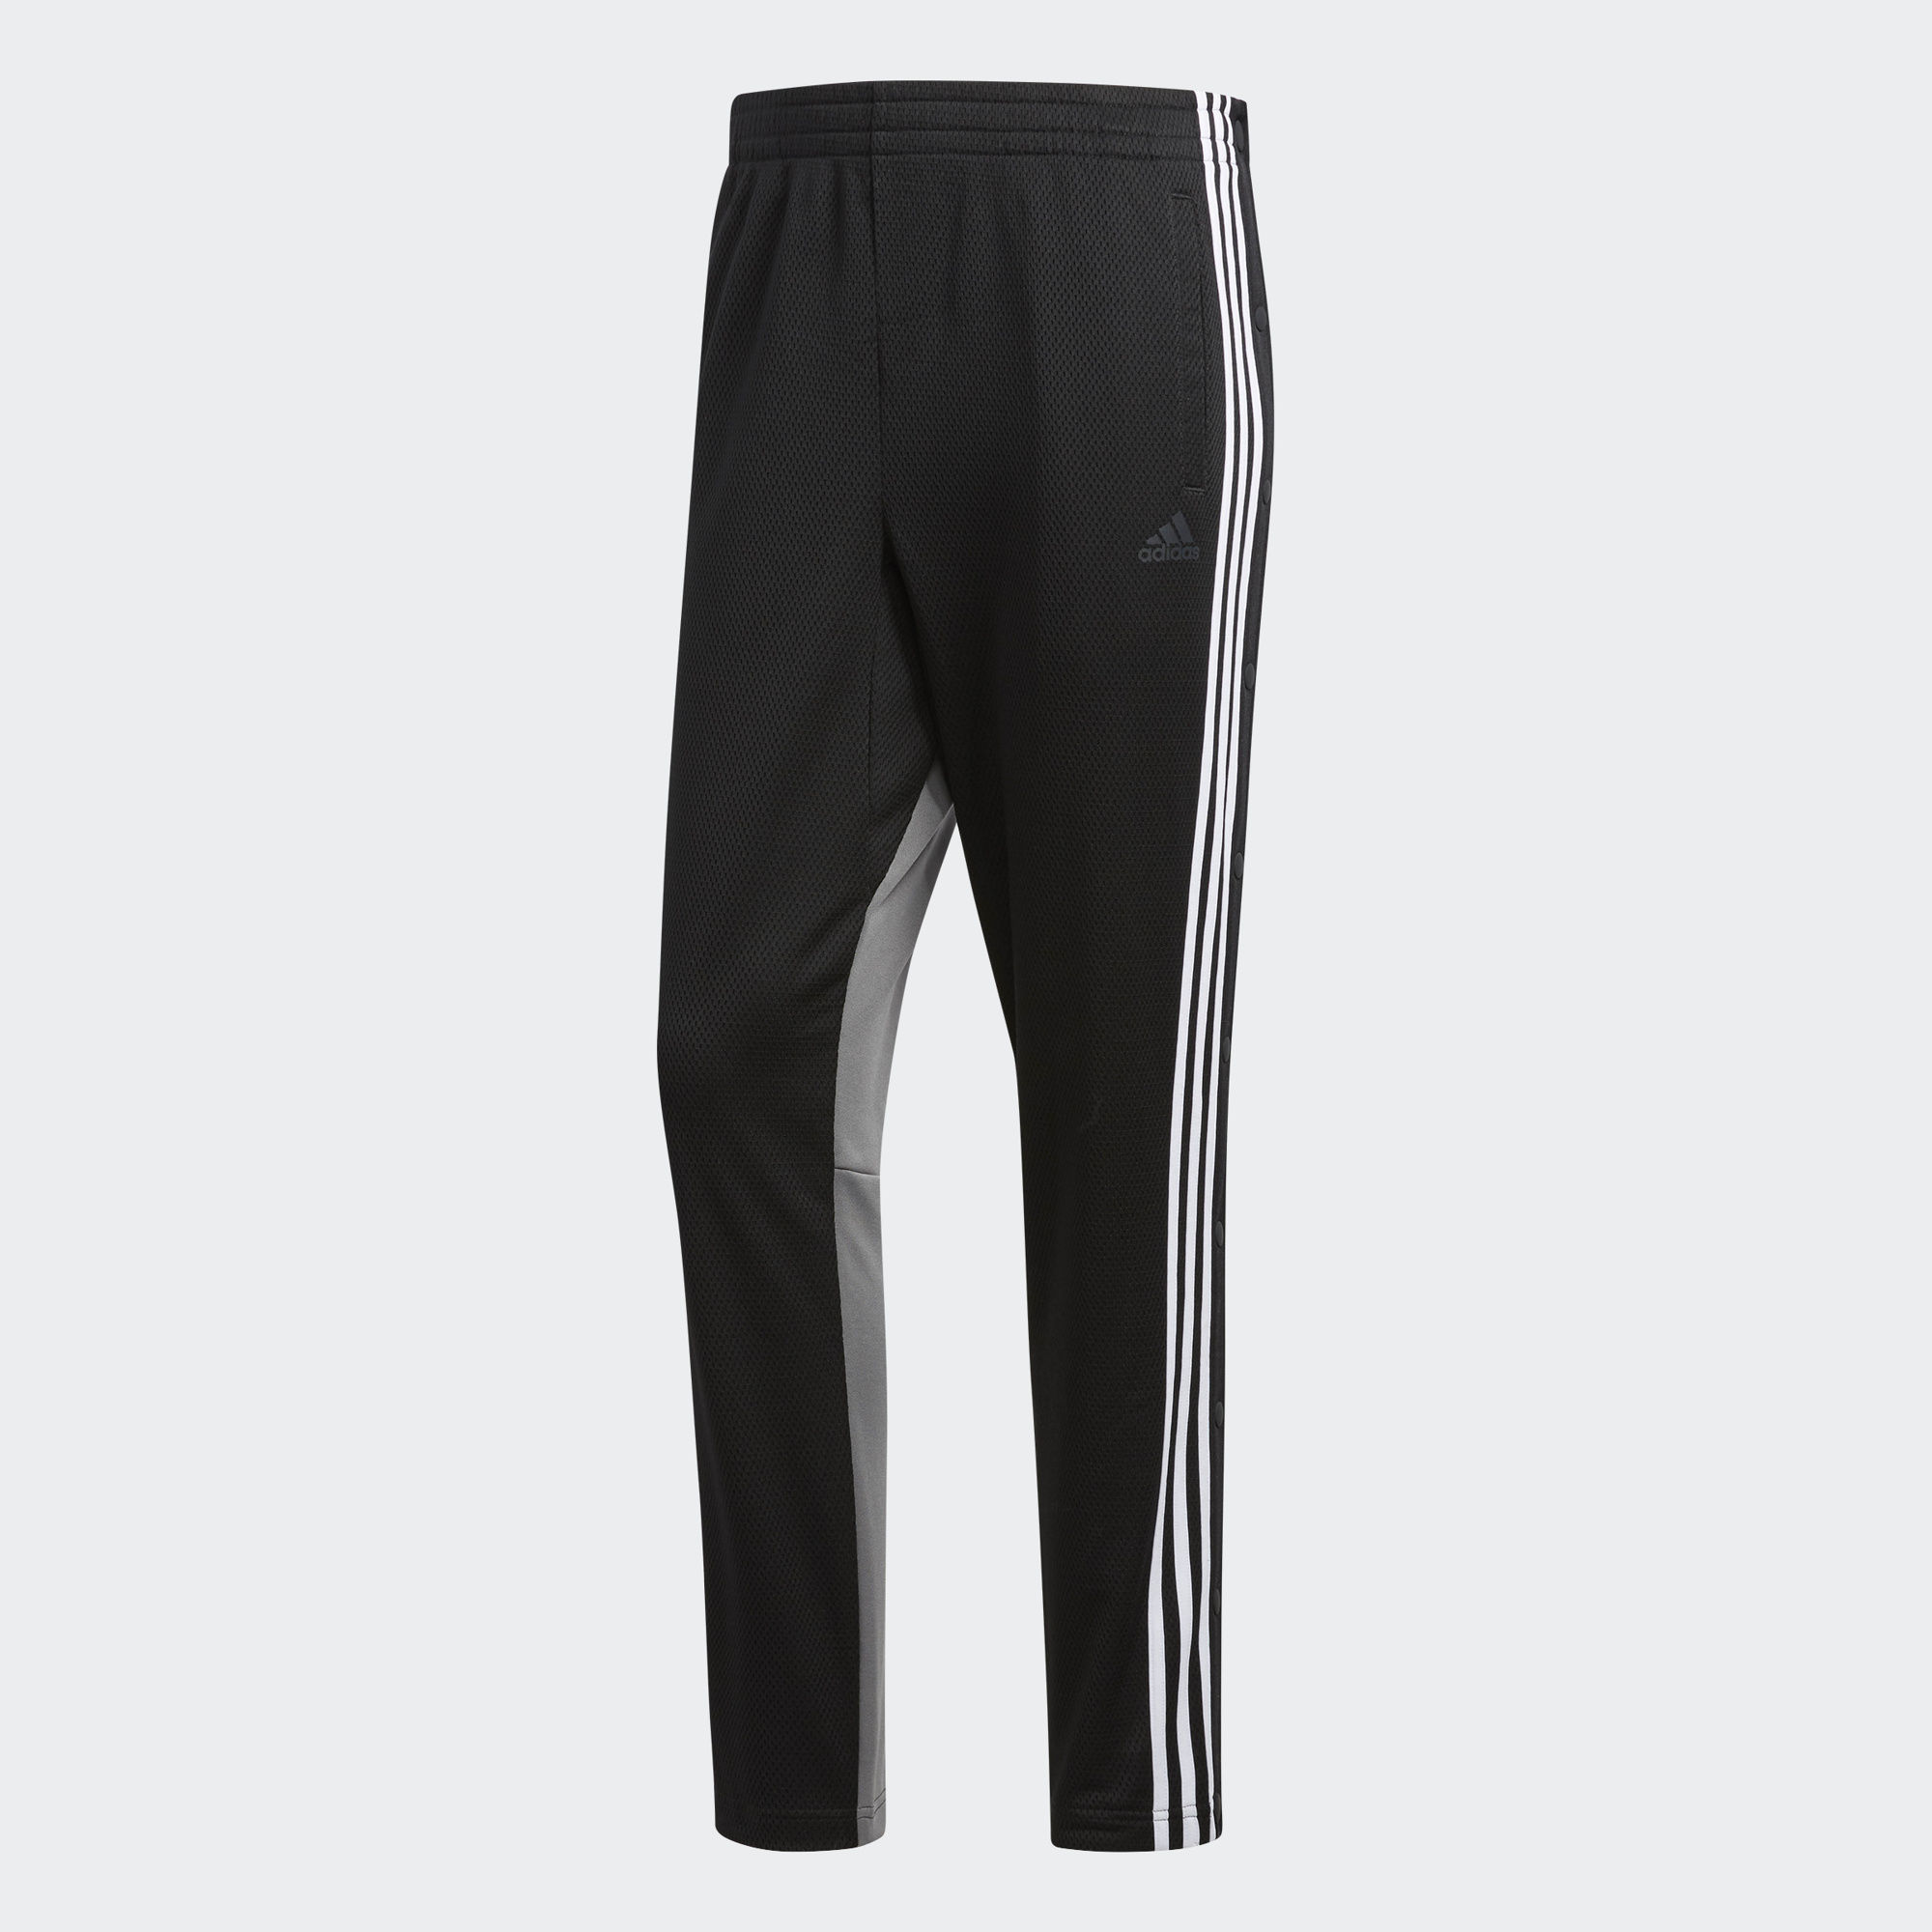 787561fd3fb46 ADIDAS ID TRACK PANT MX MEN'S, Men's Tights & Pants: National ...